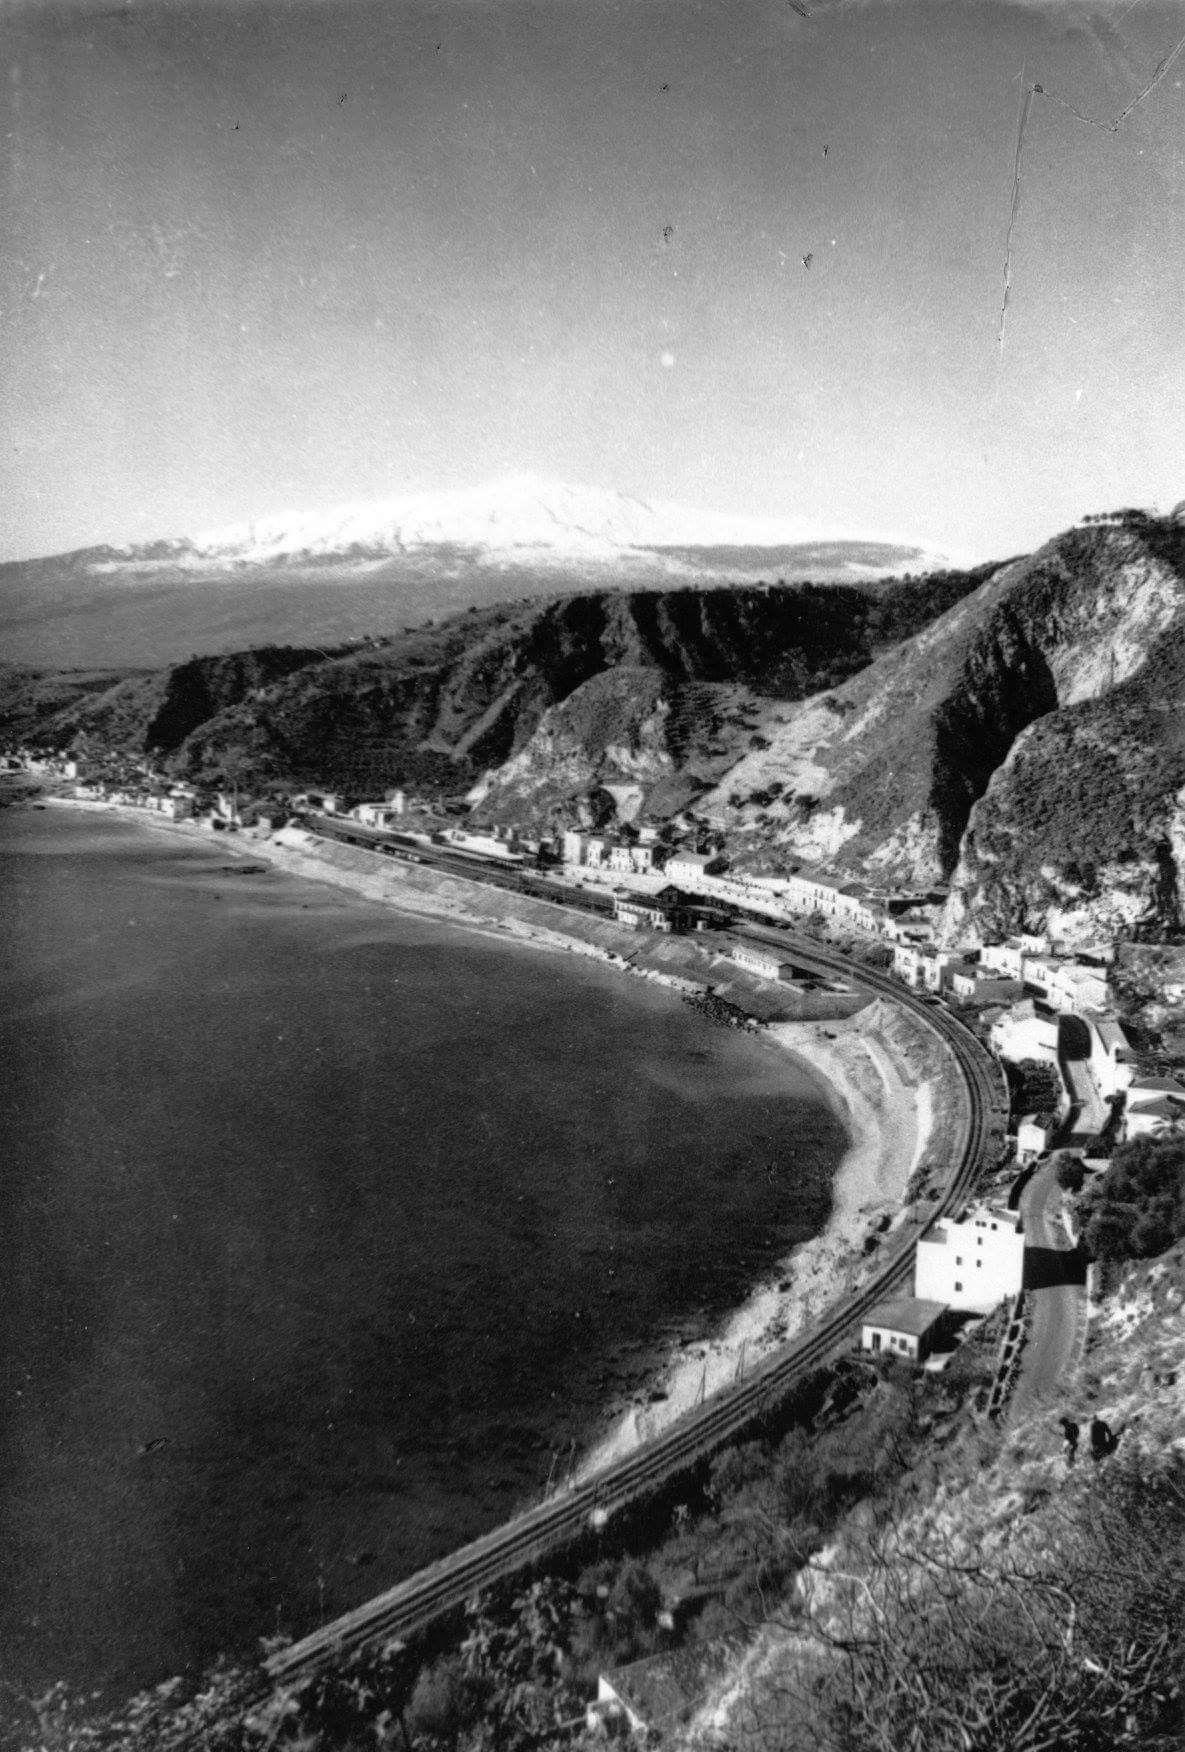 Giardini Naxos Me Come Eravamo Anno 1925 Circa Panorama